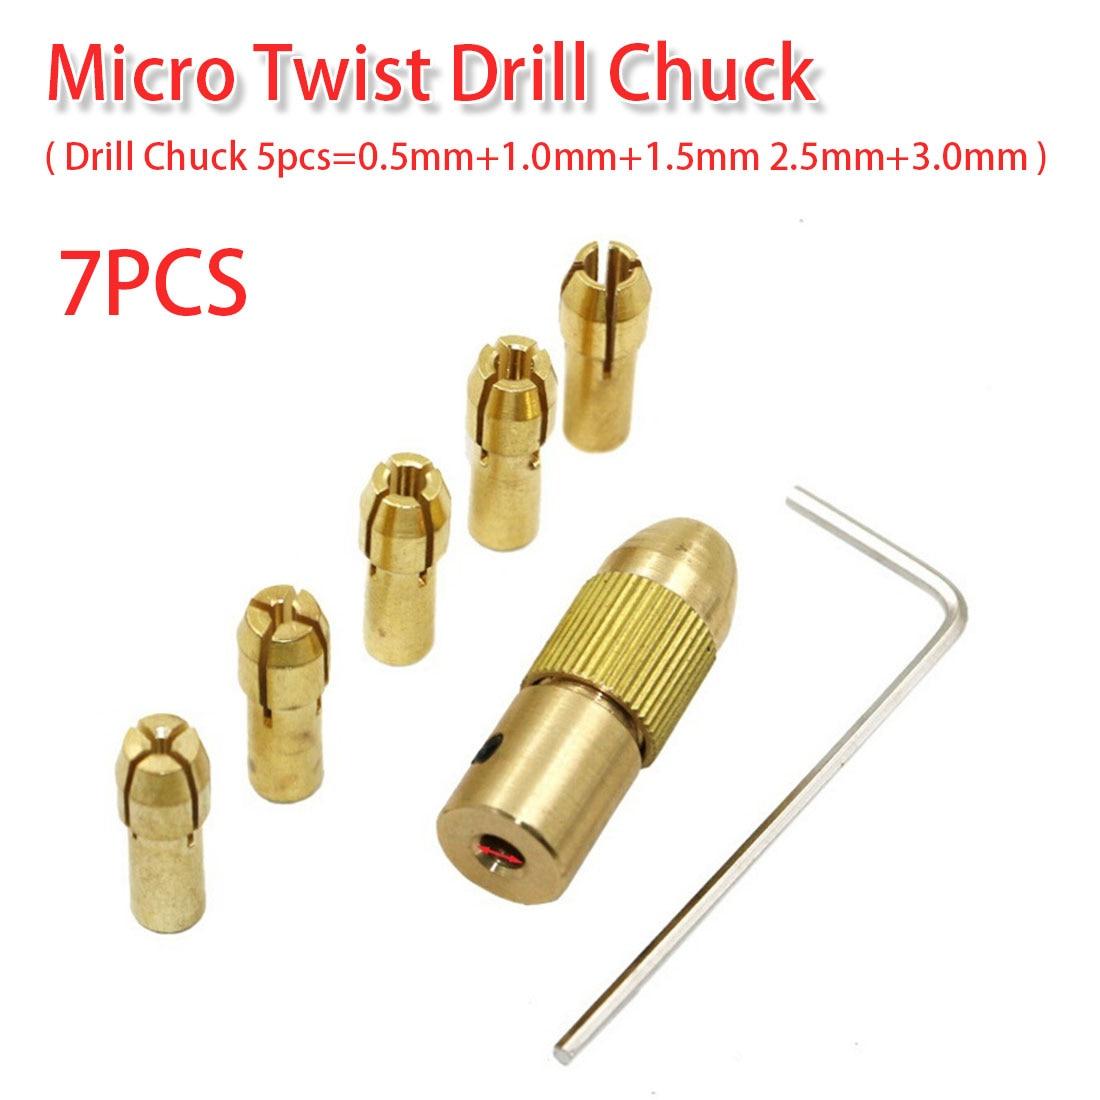 0.5-3.0mm Brass Drill Chuck Electric Drill Bit Collet Twist Drill Chuck Set 2.35mm Shank For ABS/ Light Wood Board/ Cardboard